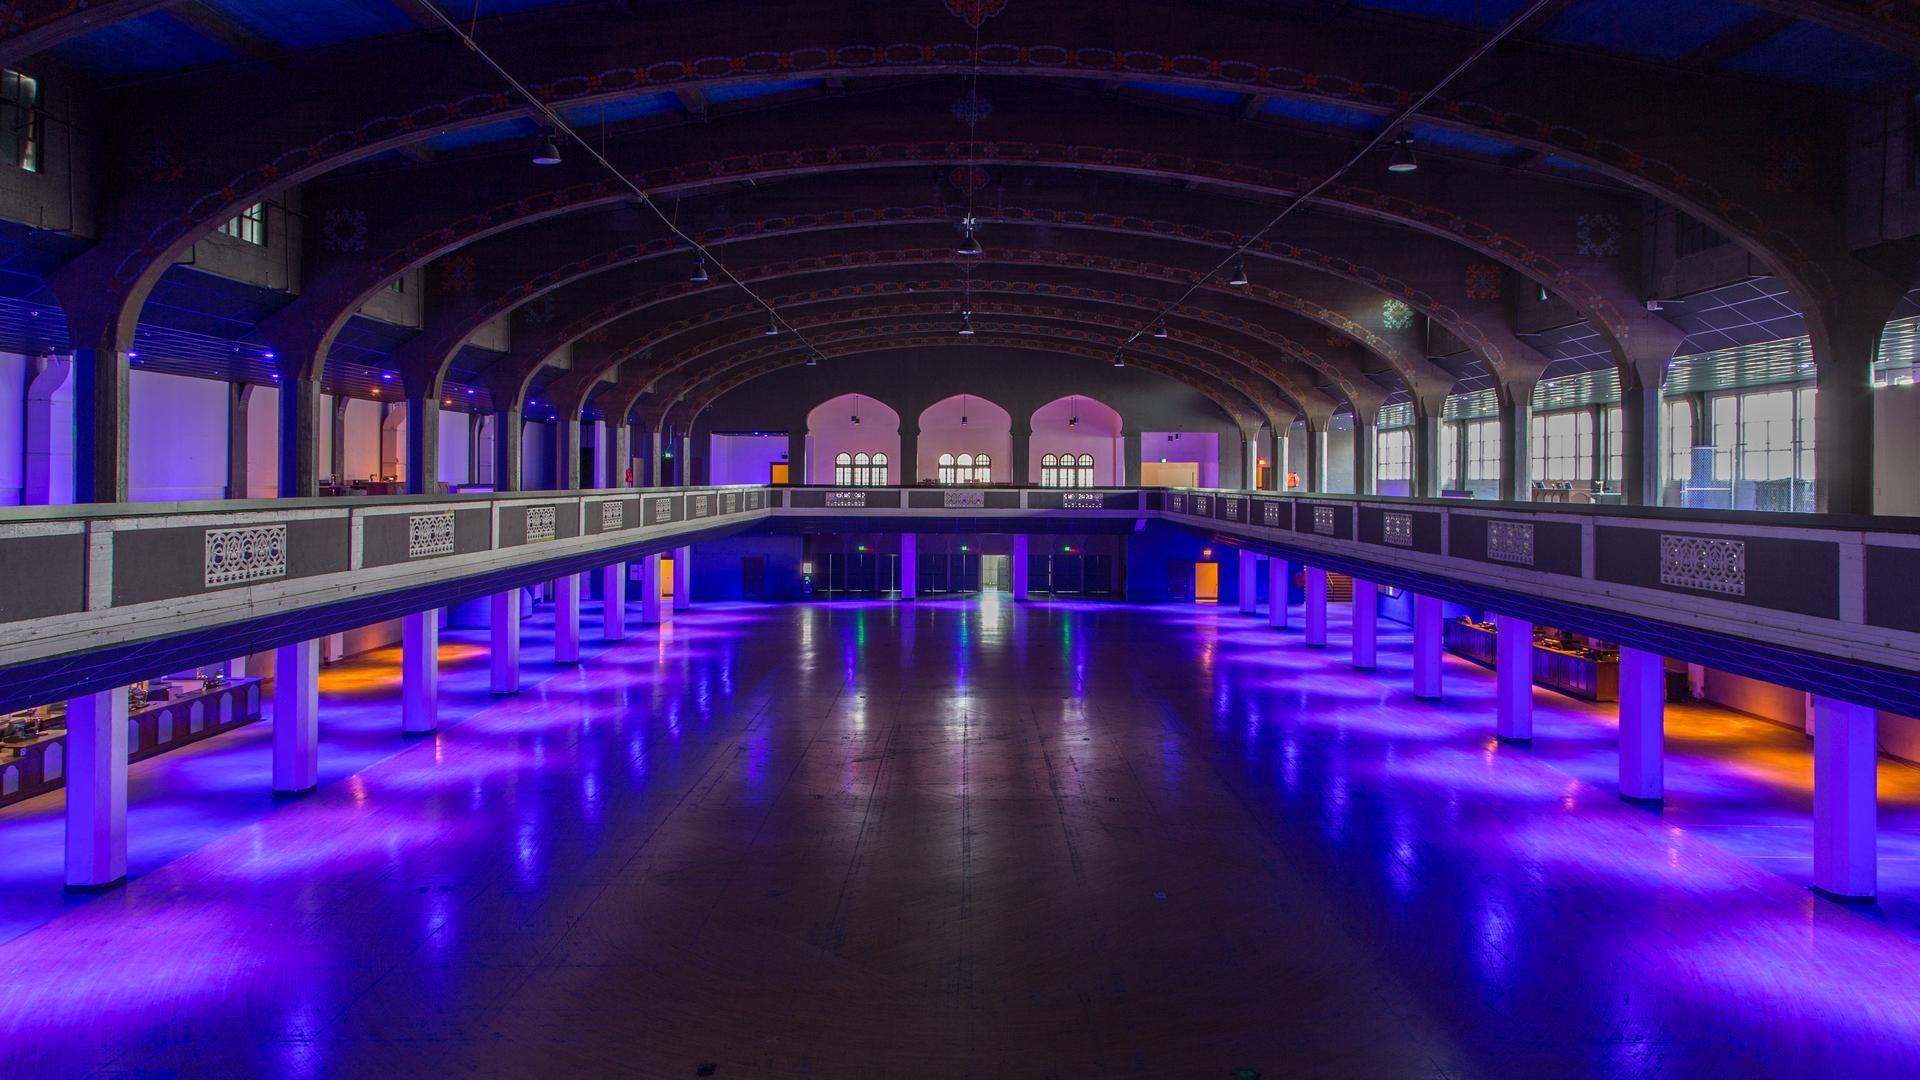 Shrine Auditorium Expo Hall Eventup Event Venue Spaces Los Angeles Wedding Locations Wedding Venue Los Angeles